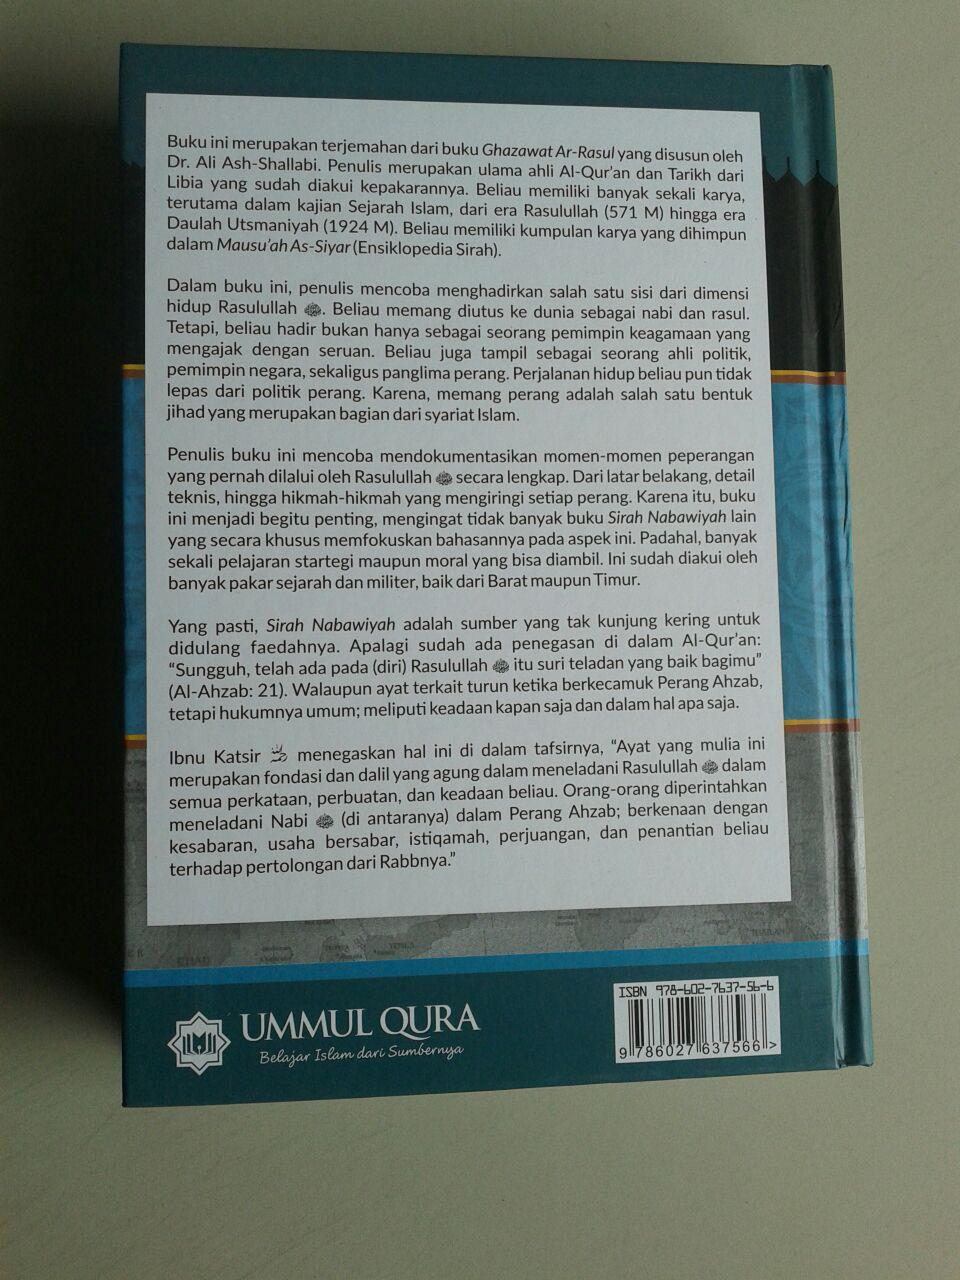 Buku Peperangan Rasulullah Shallallahu Alaihi wa Sallam cover